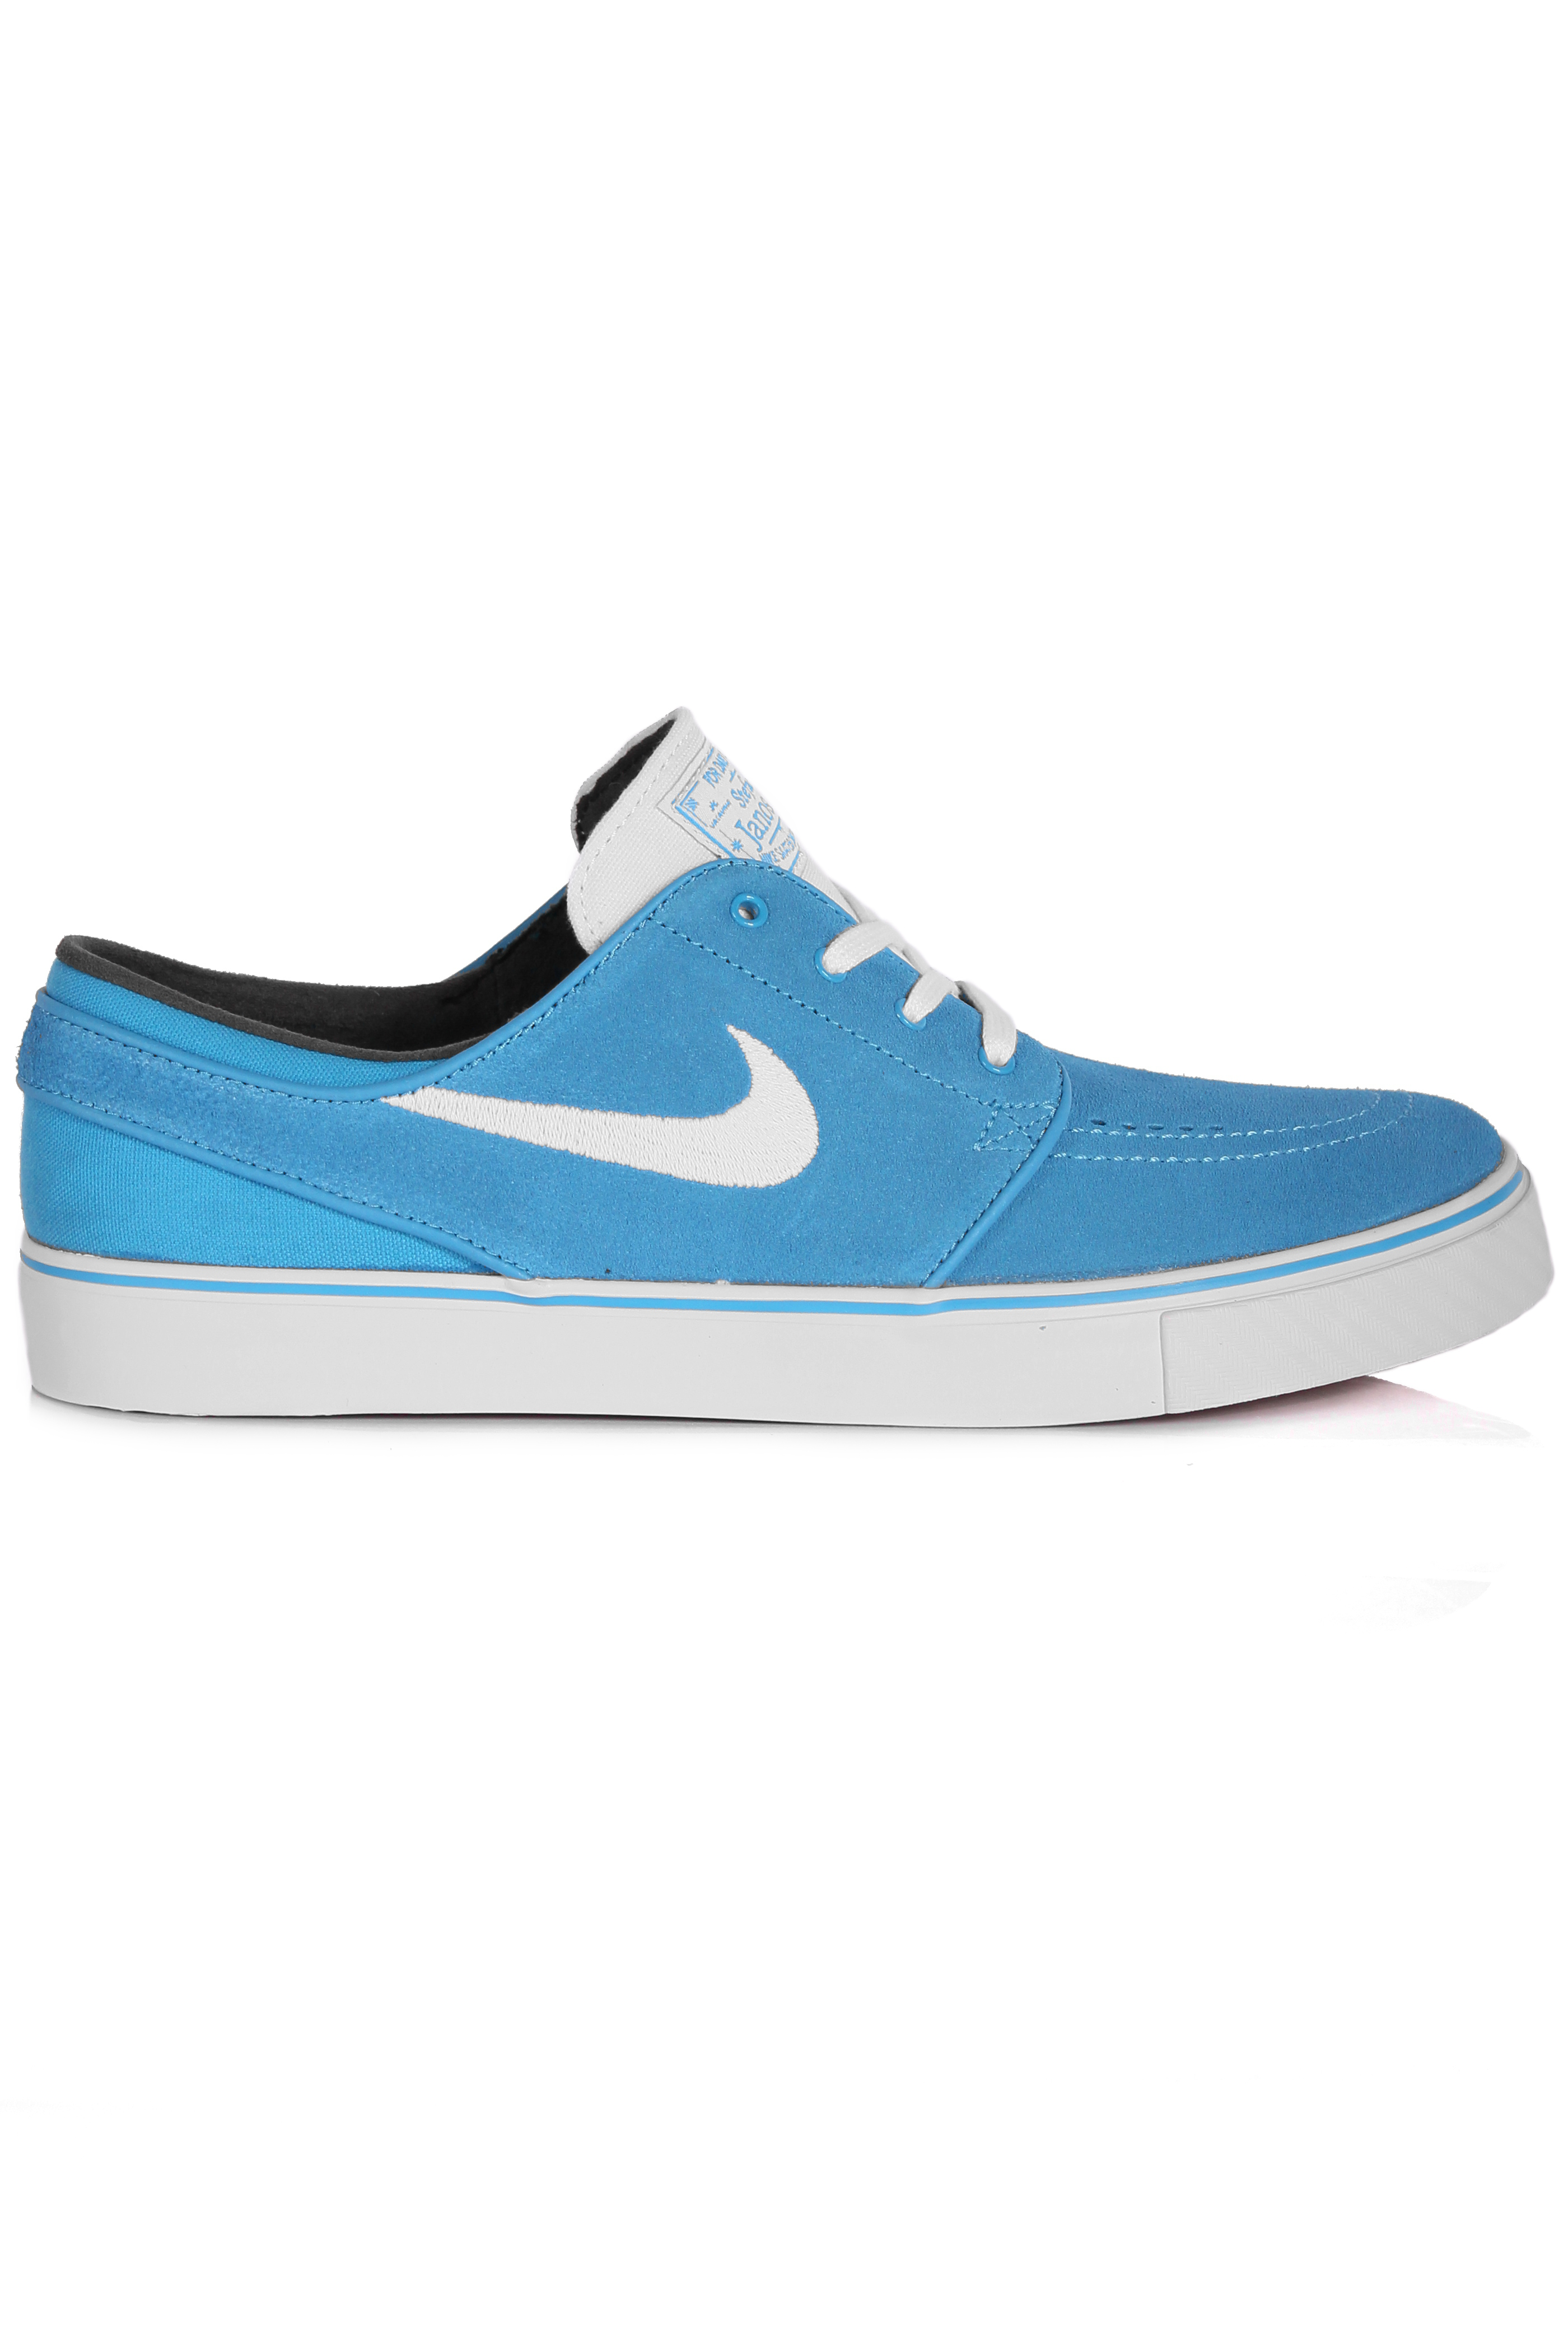 Buty Nike Sb Stefan Janoski Vivid Blue